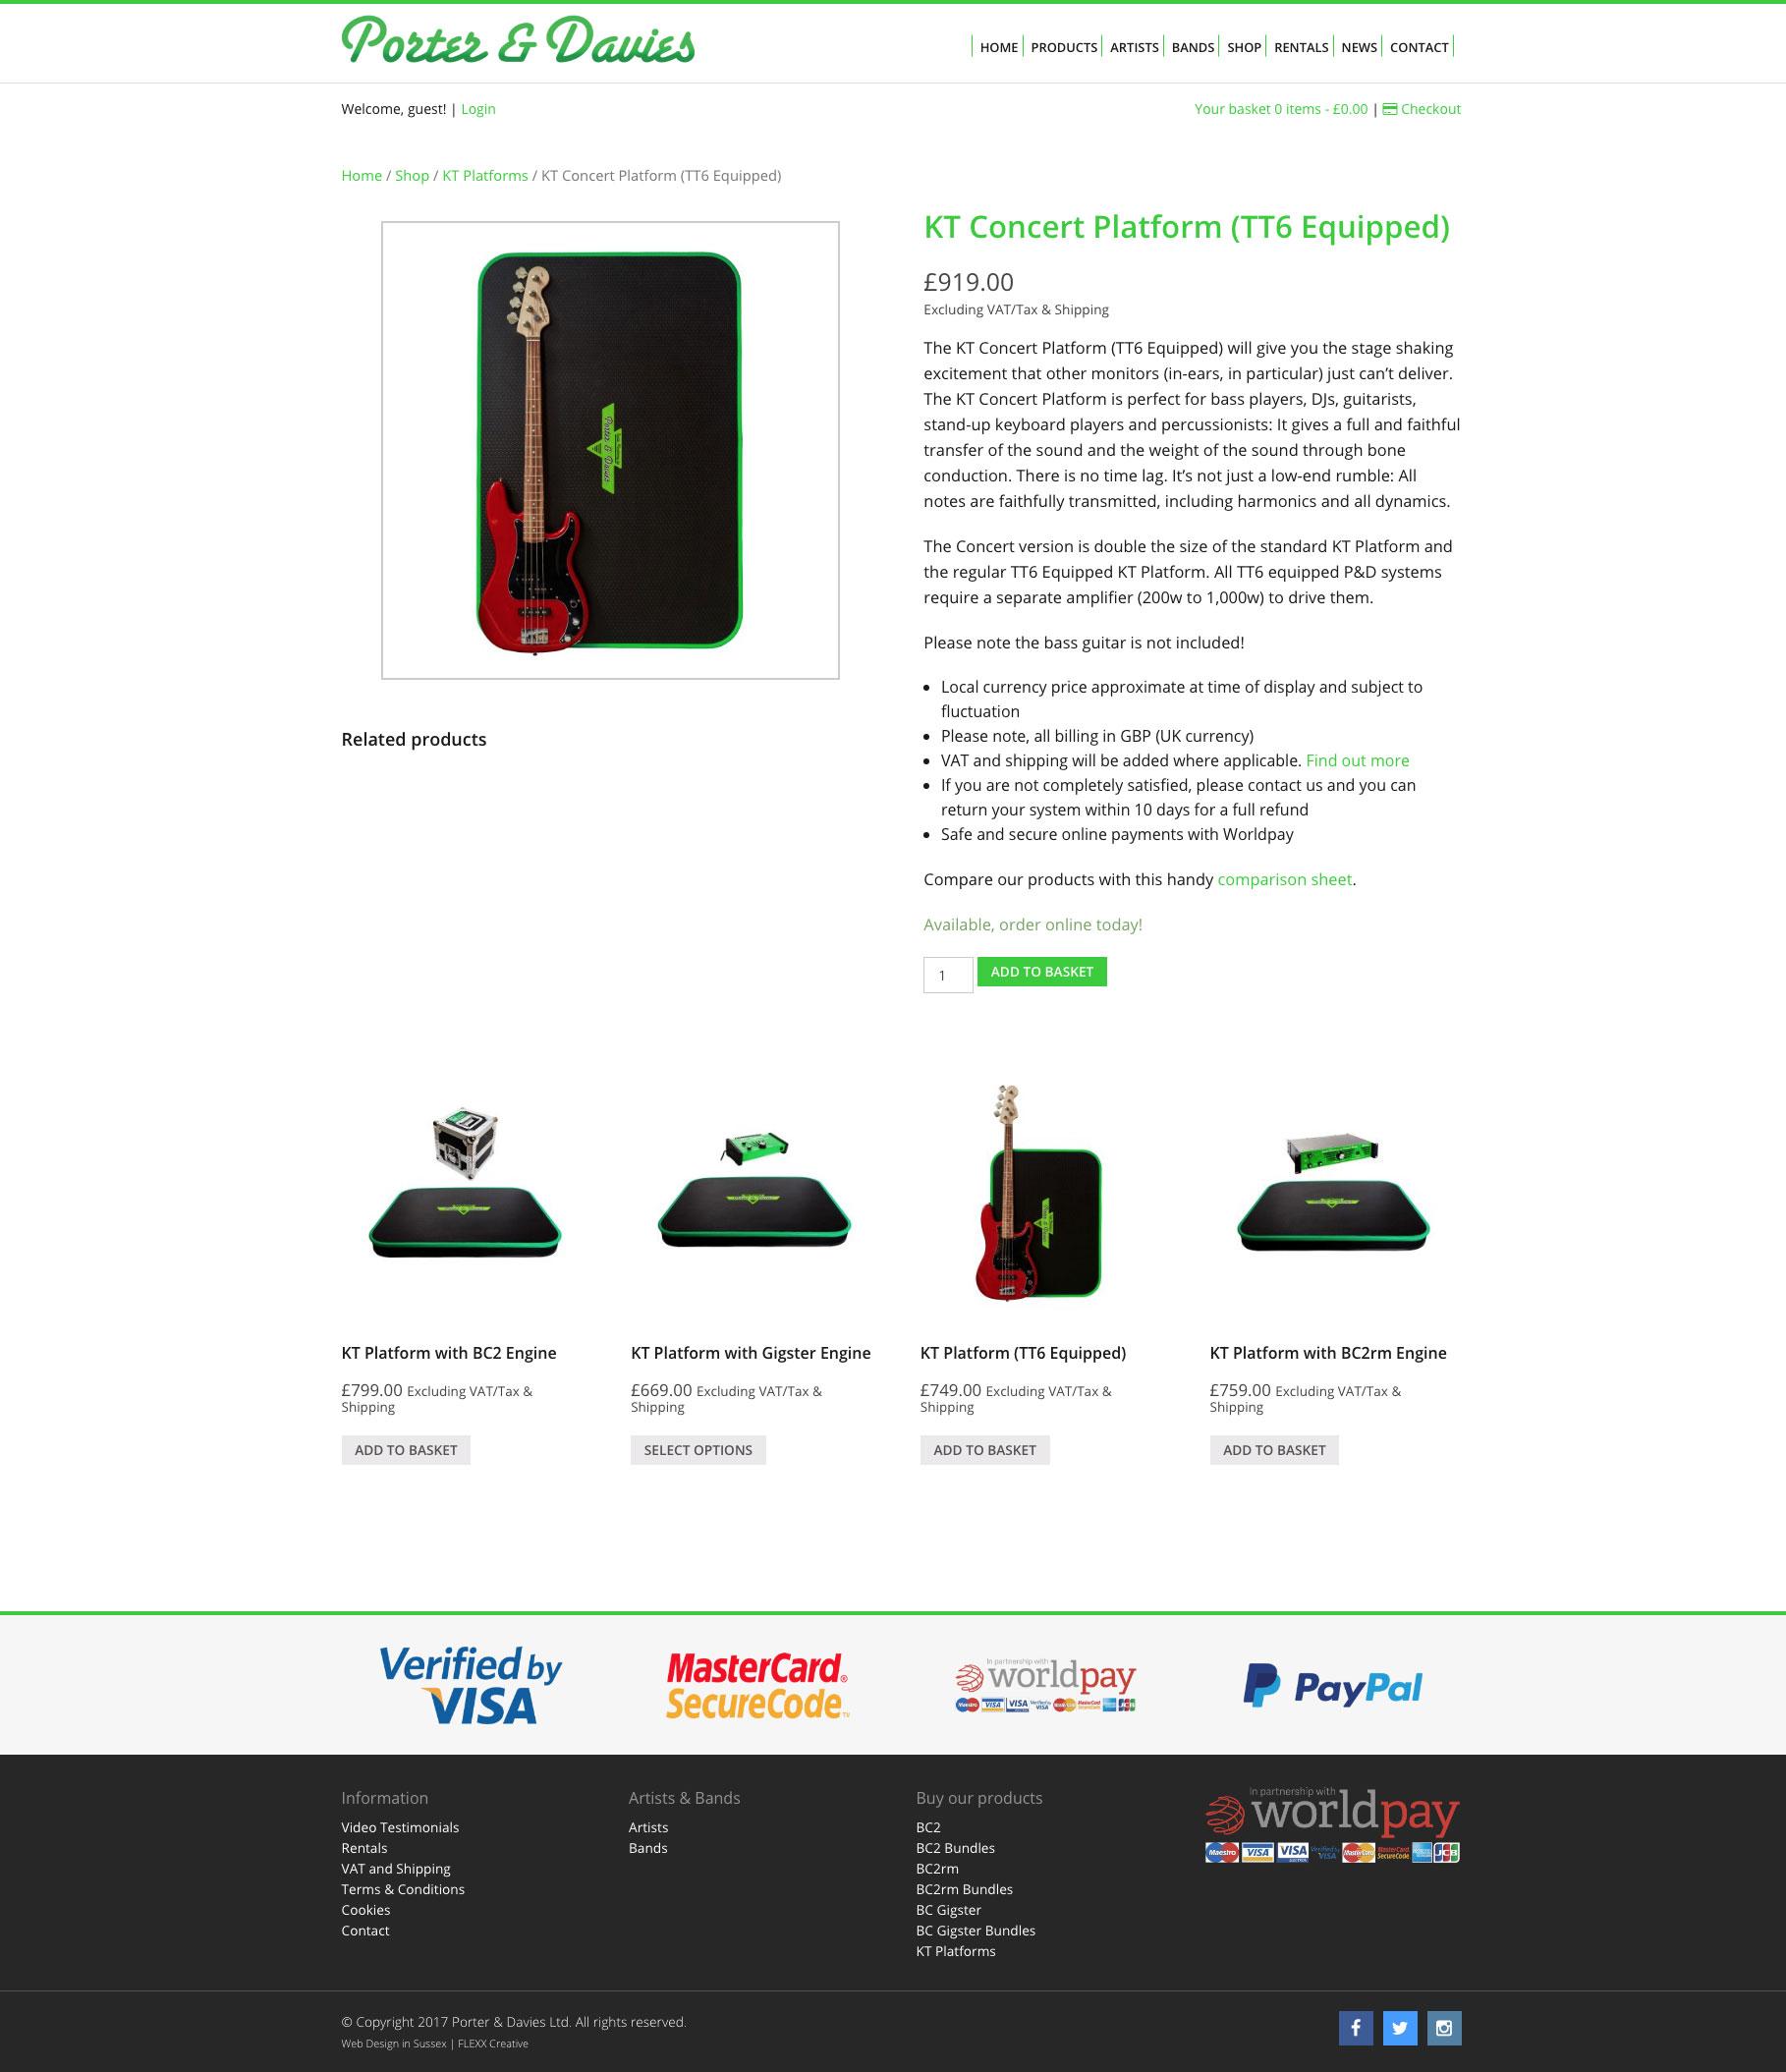 eCommerce Web Design Costs